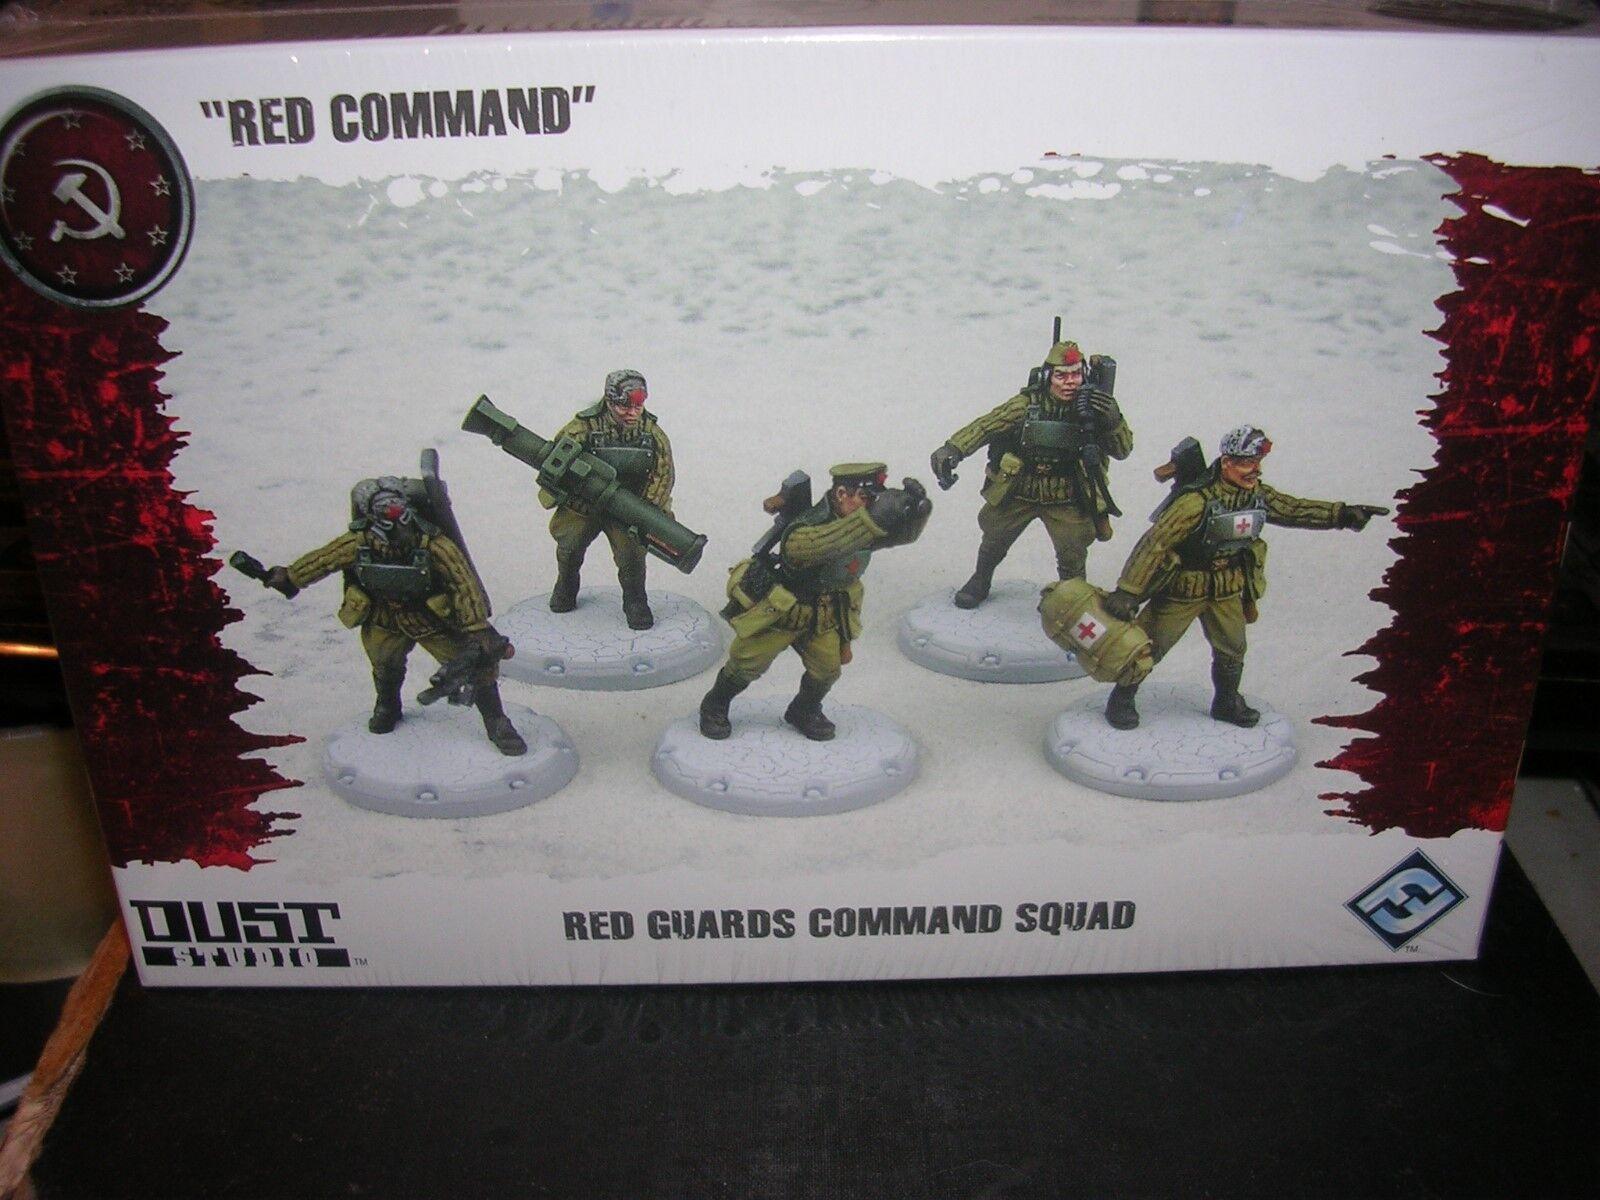 Staub rotgardisten kommando - - - taktik 7c4a6c